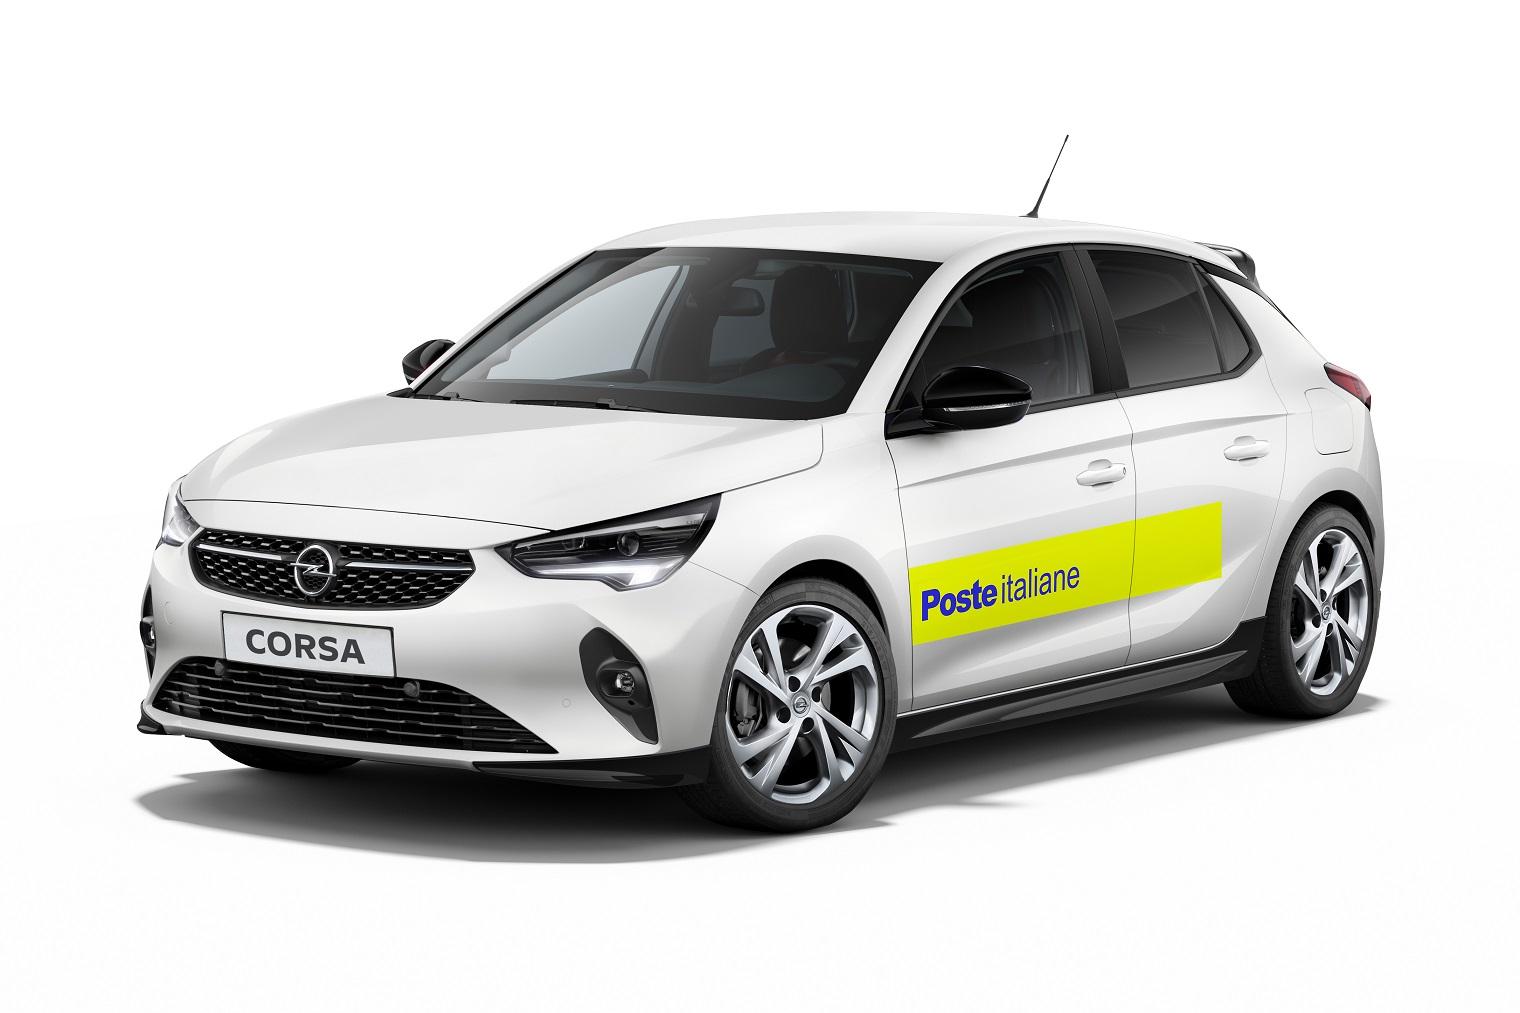 Opel Corsa-e Poste Italiane